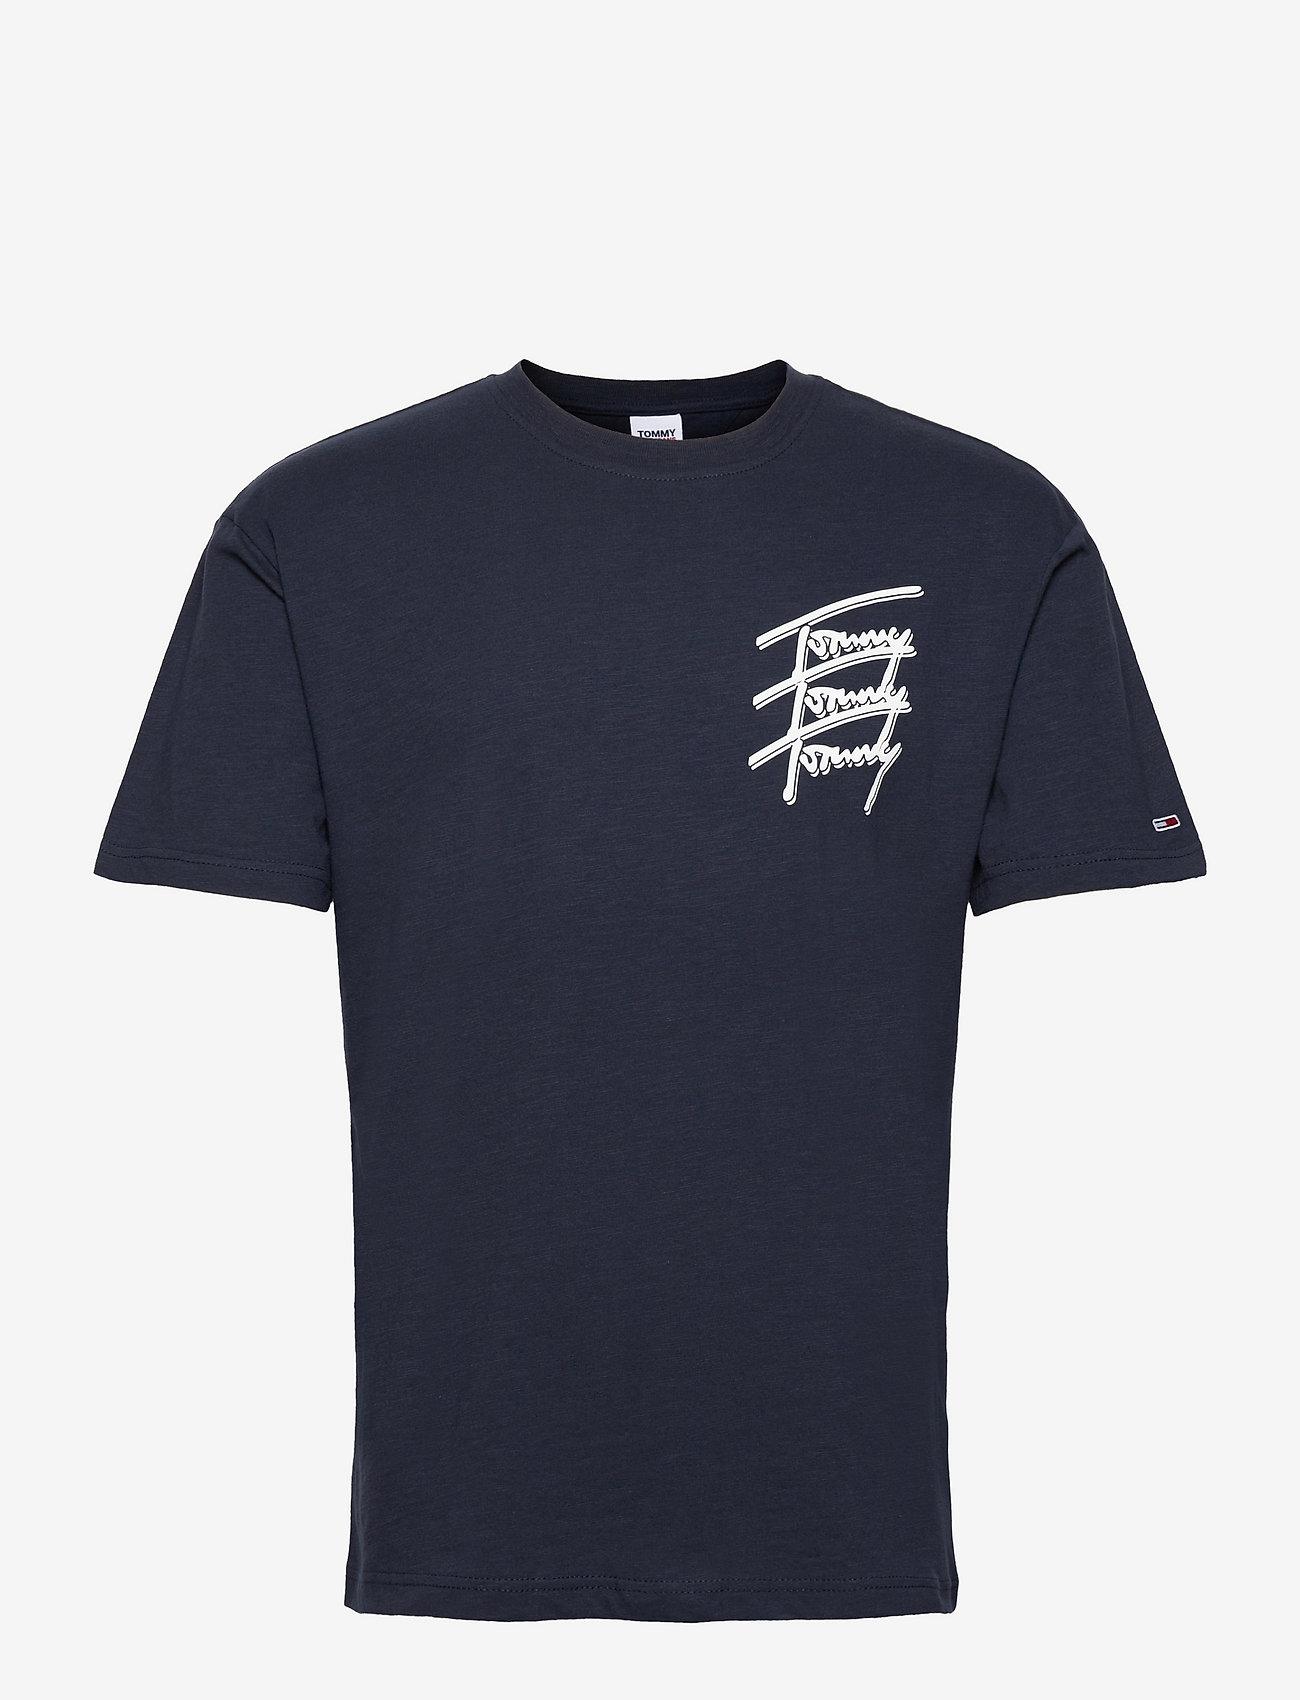 Tommy Jeans - TJM TOMMY REPEAT SCRIPT TEE - kortärmade t-shirts - twilight navy - 0